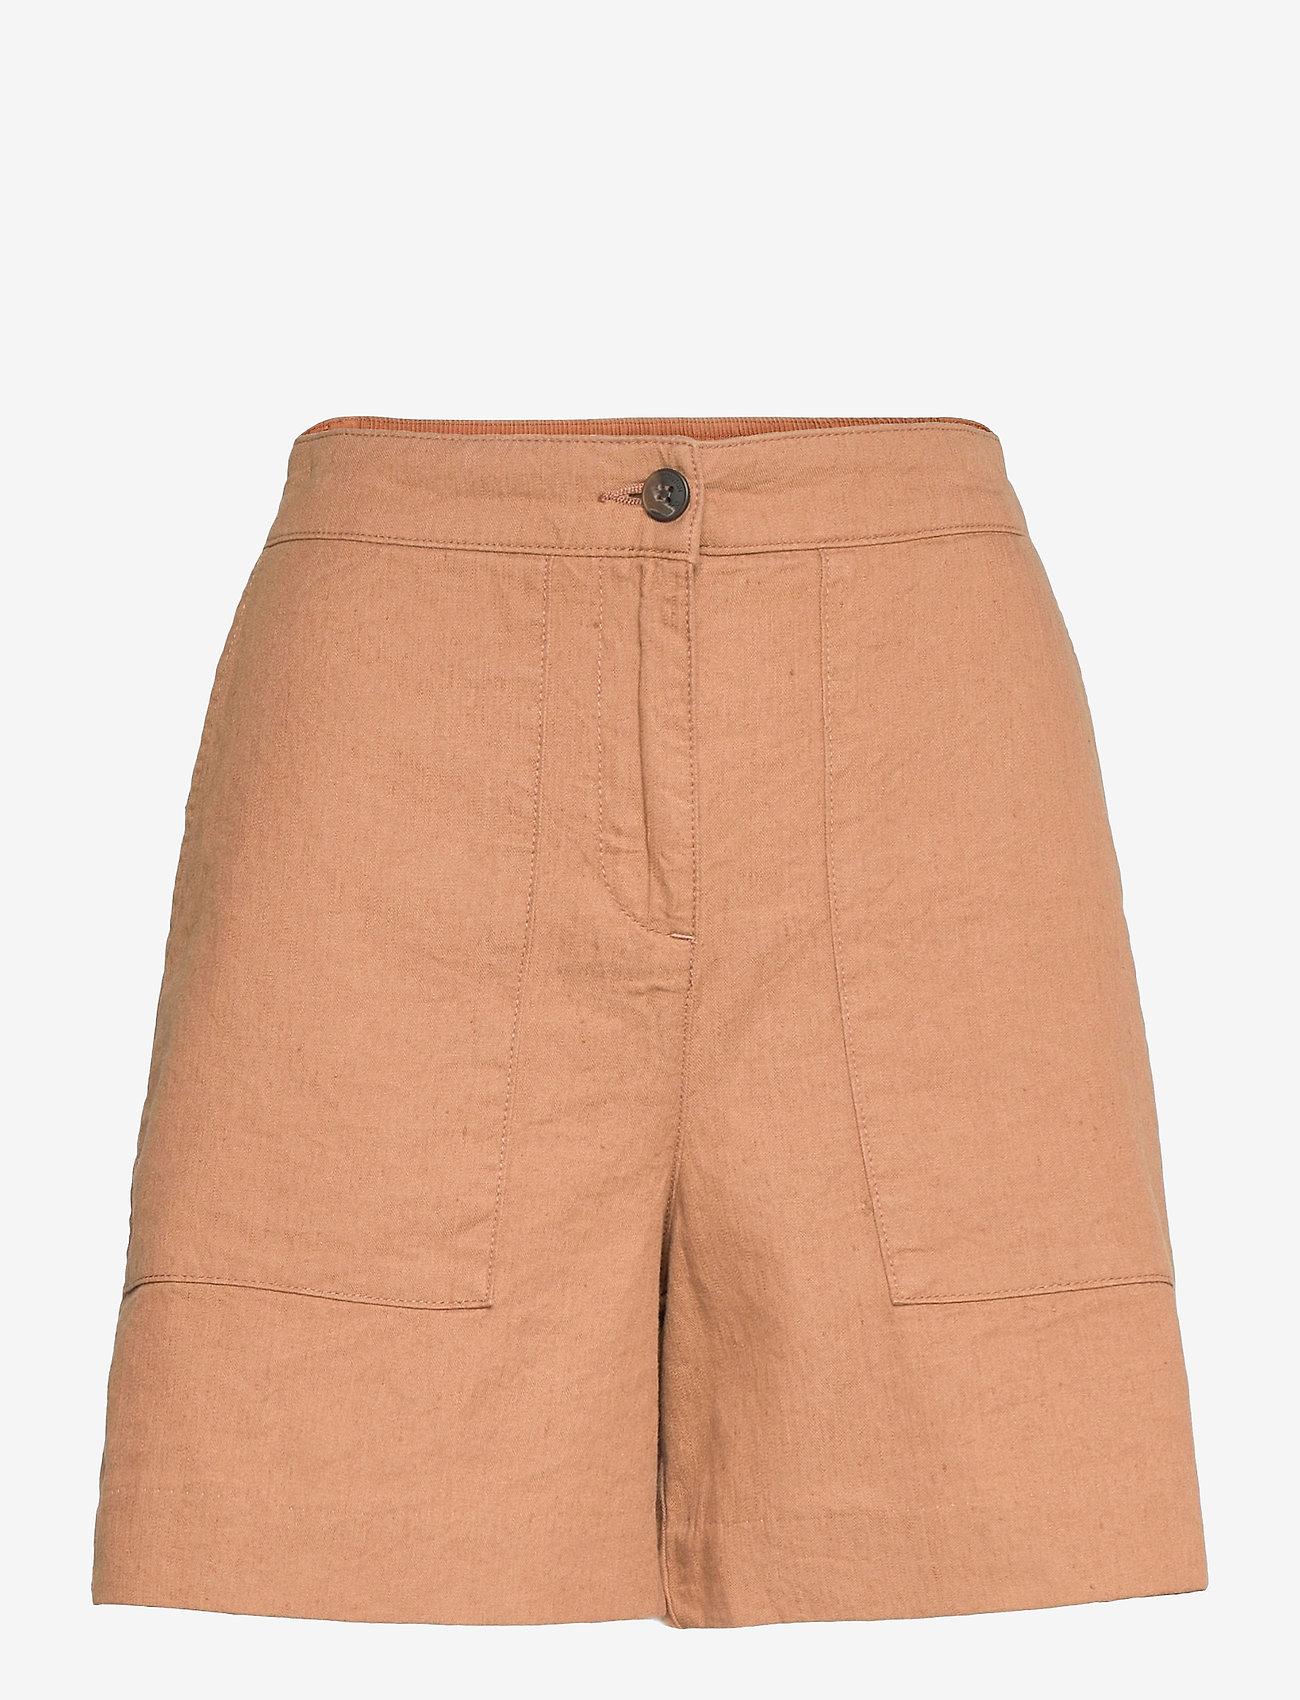 Lexington Clothing - Juliana Linen Blend Shorts - chino shorts - brown - 1